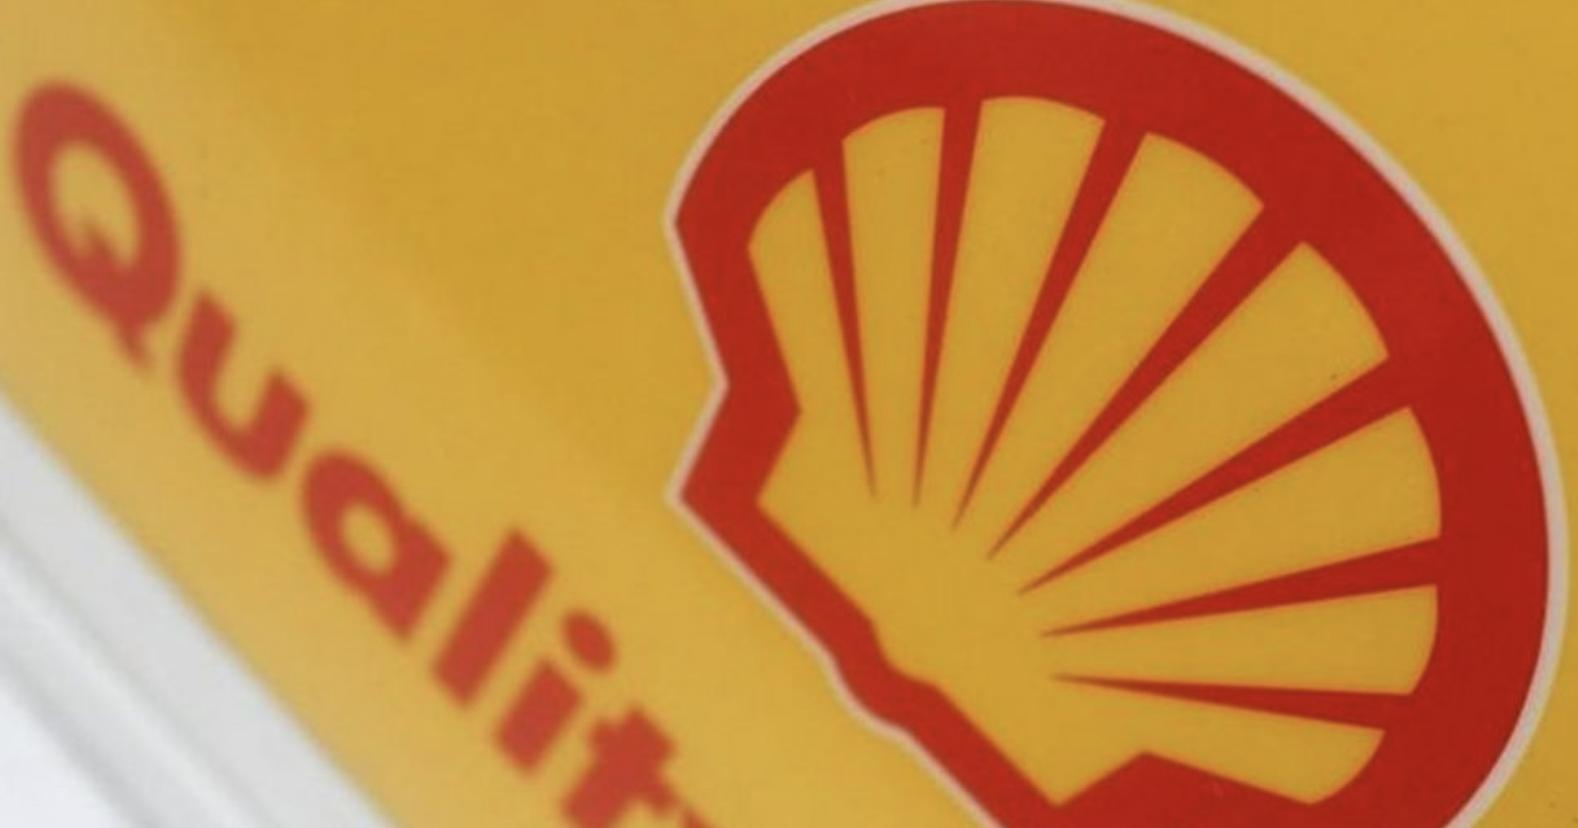 Royal Dutch Shell to Cut More Than 300 North Sea Jobs